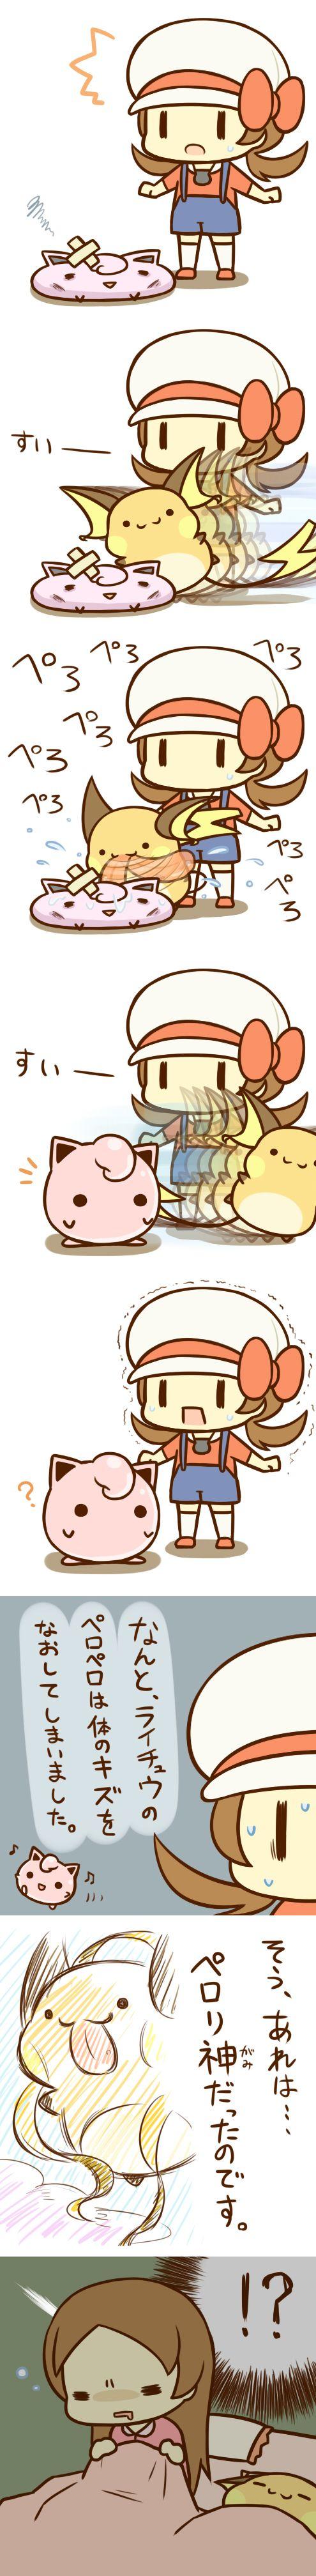 Mini Chibi Raichu Adventures 101 (Pokemon)